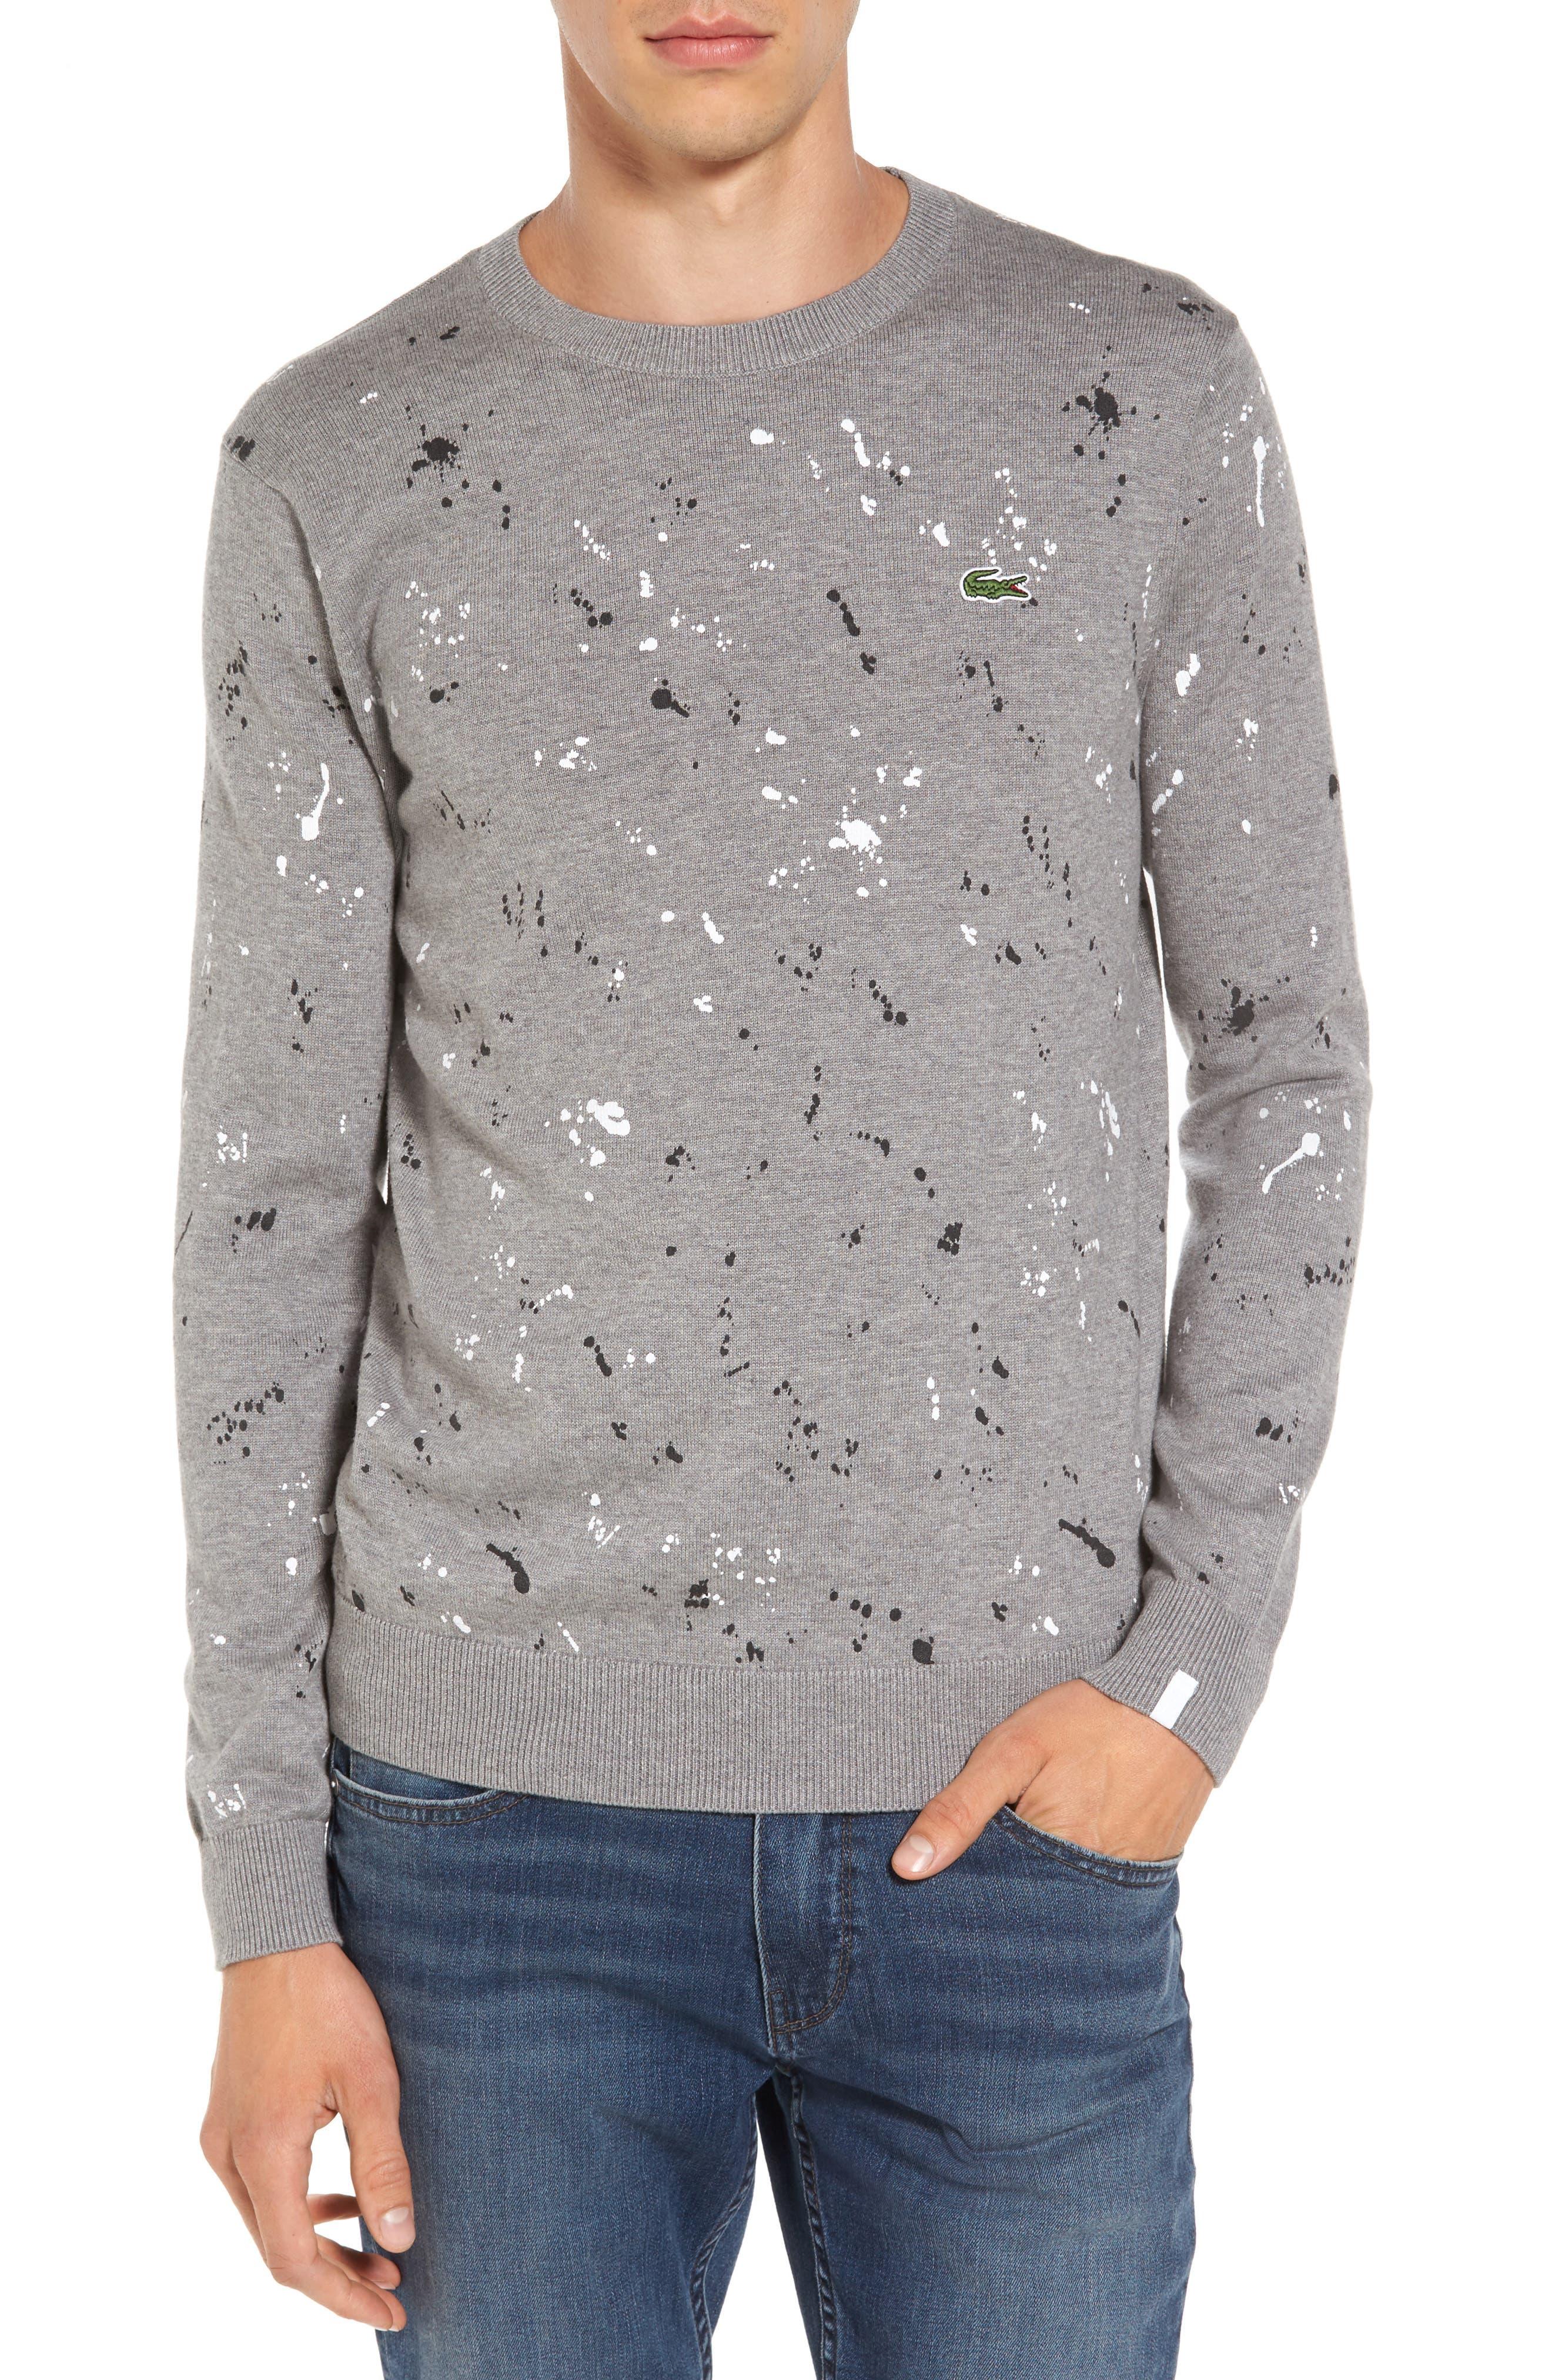 Alternate Image 1 Selected - Lacoste Splatter Sweater